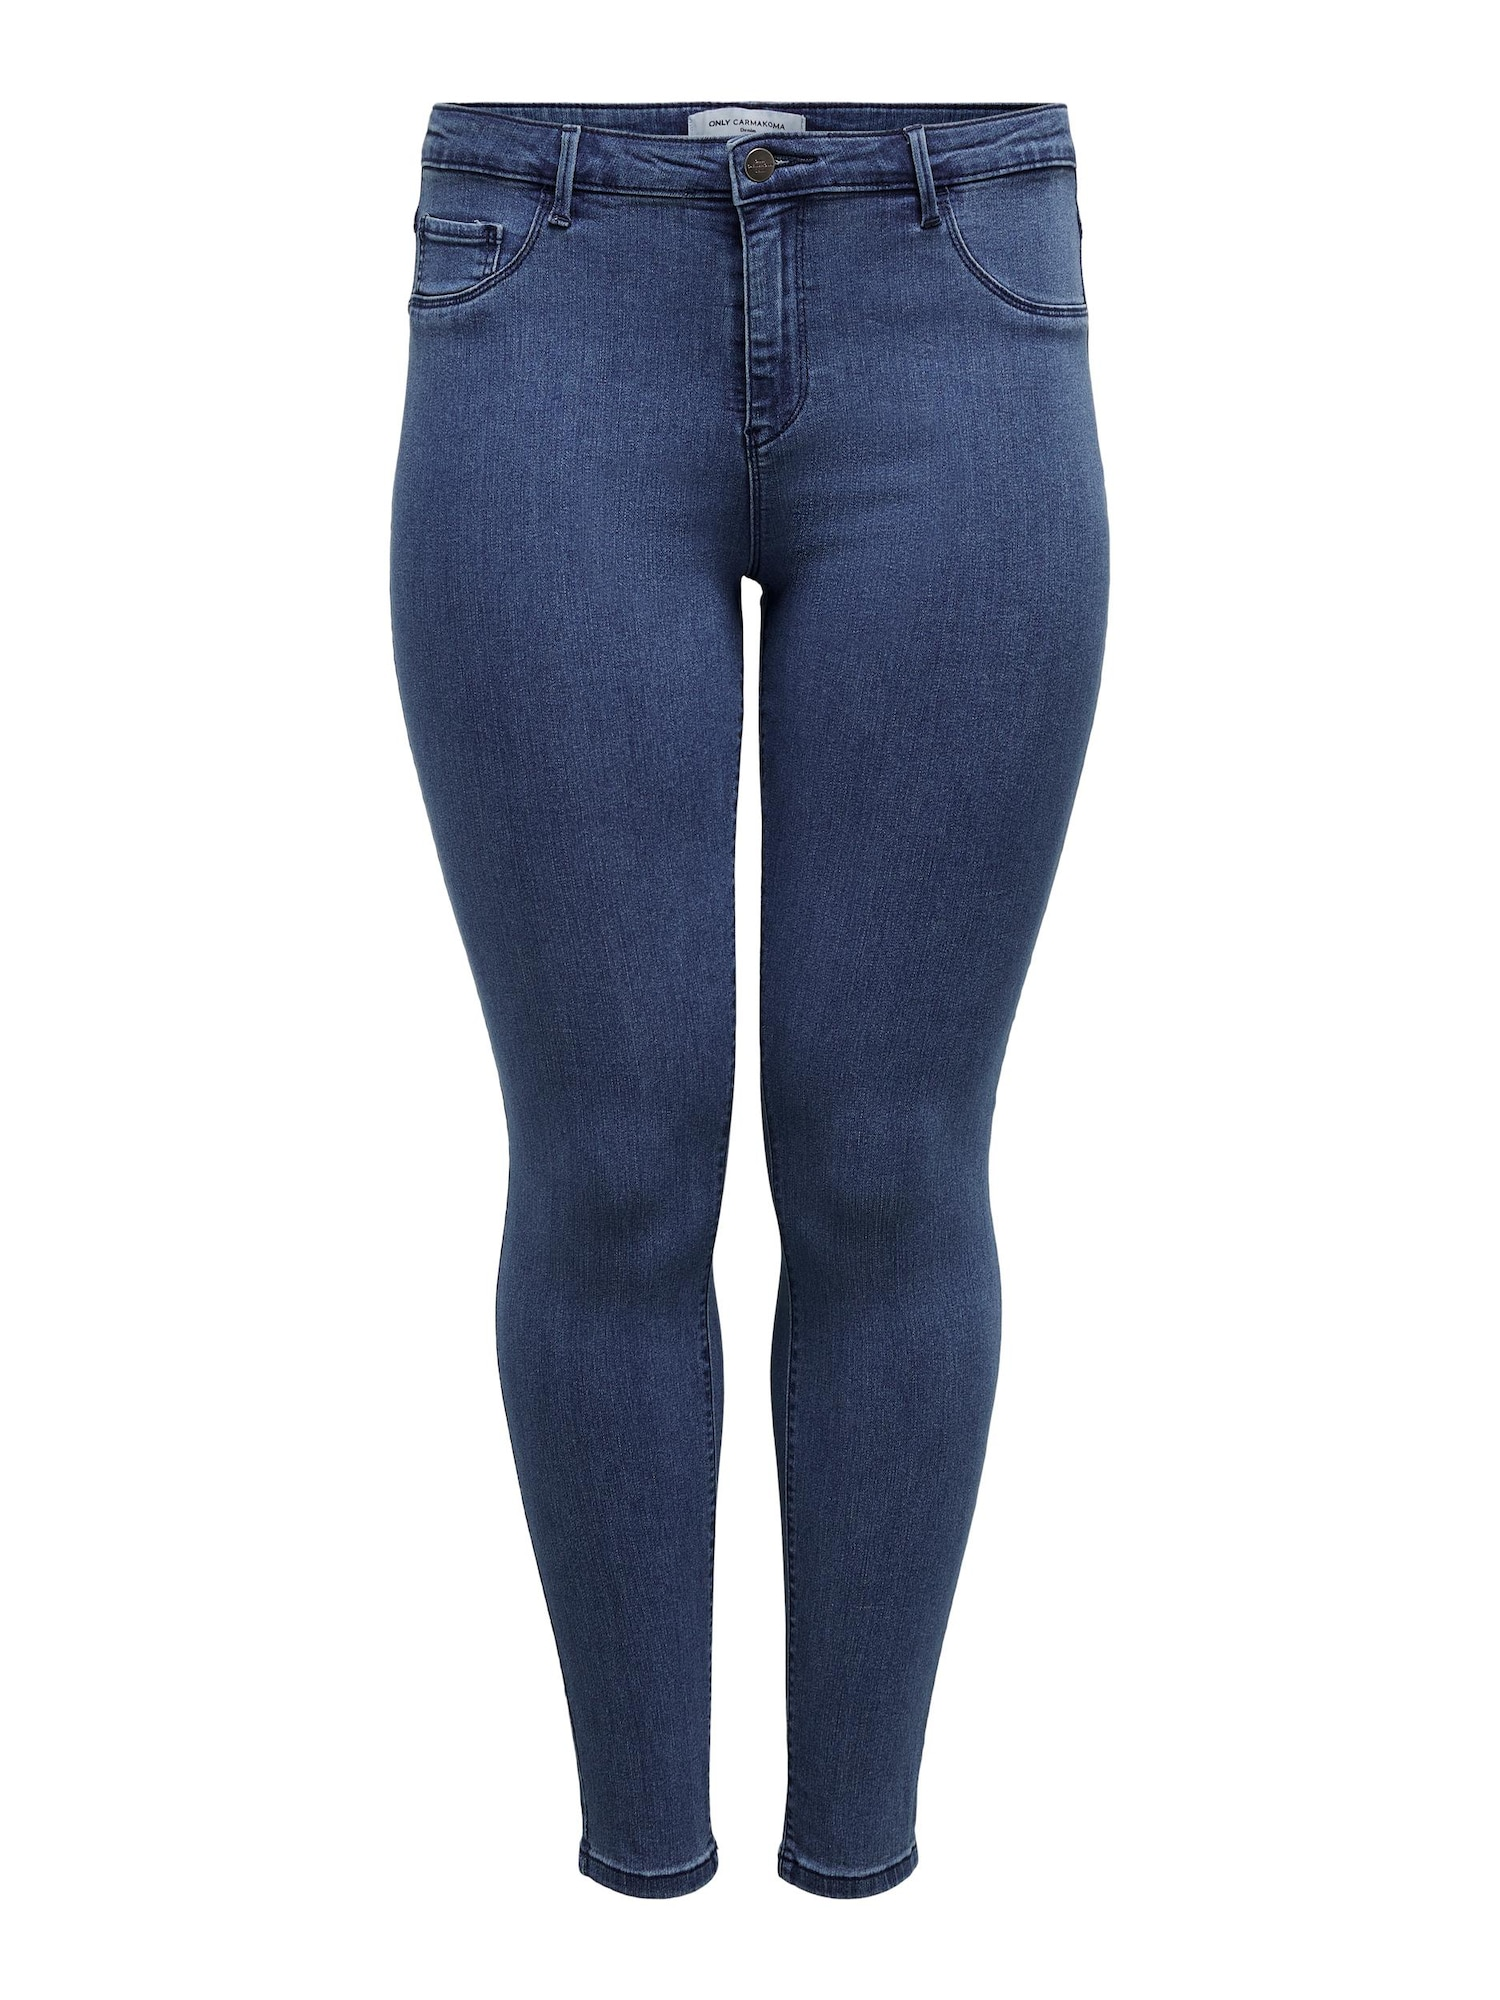 ONLY Carmakoma Džinsai tamsiai (džinso) mėlyna